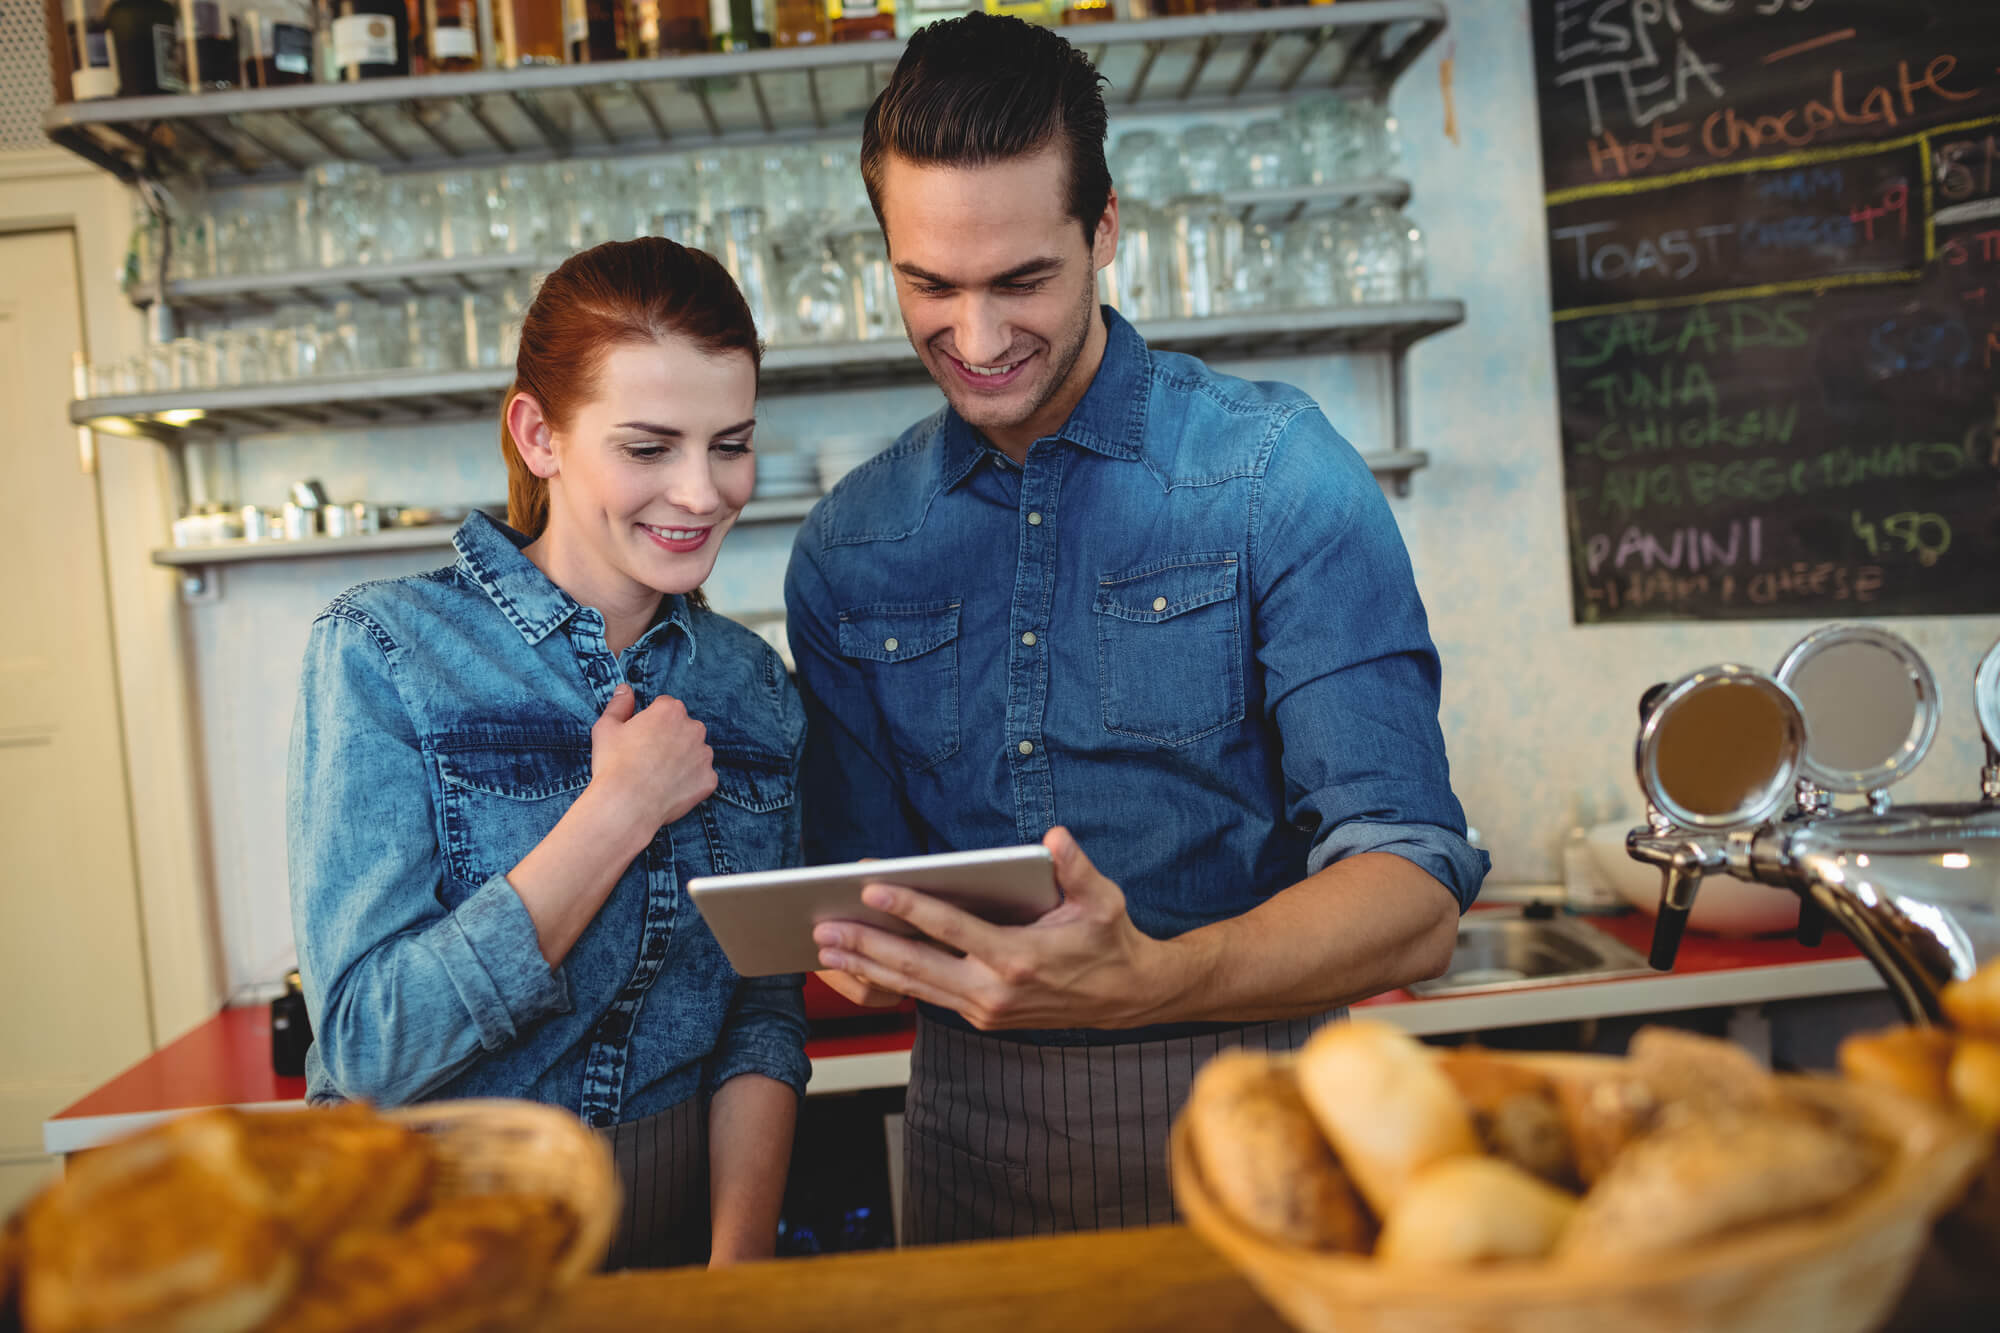 Mercado de food service: quais os riscos, desafios e oportunidades?